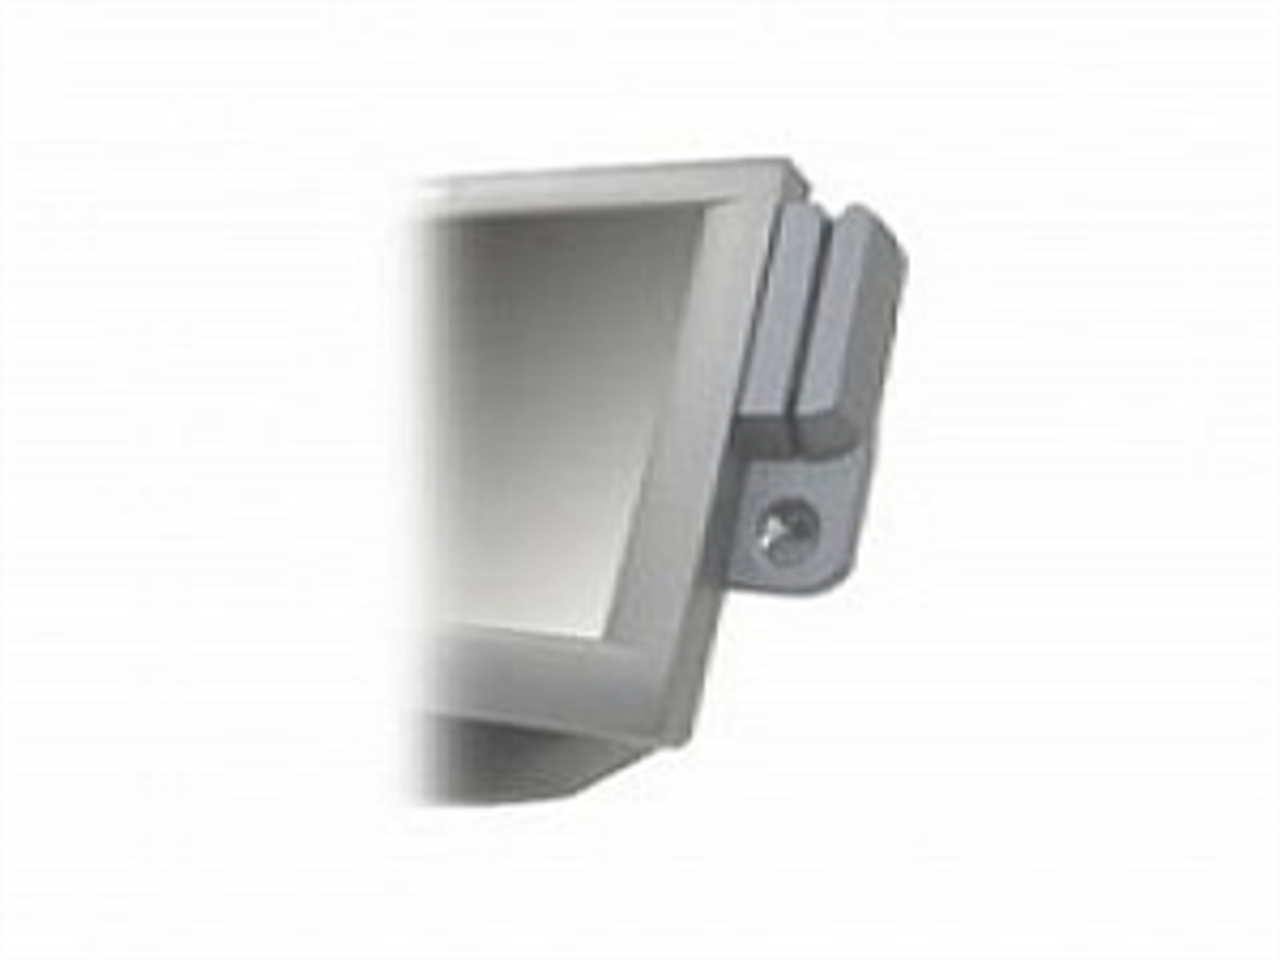 PioneerPOS Touchscreen Card Reader